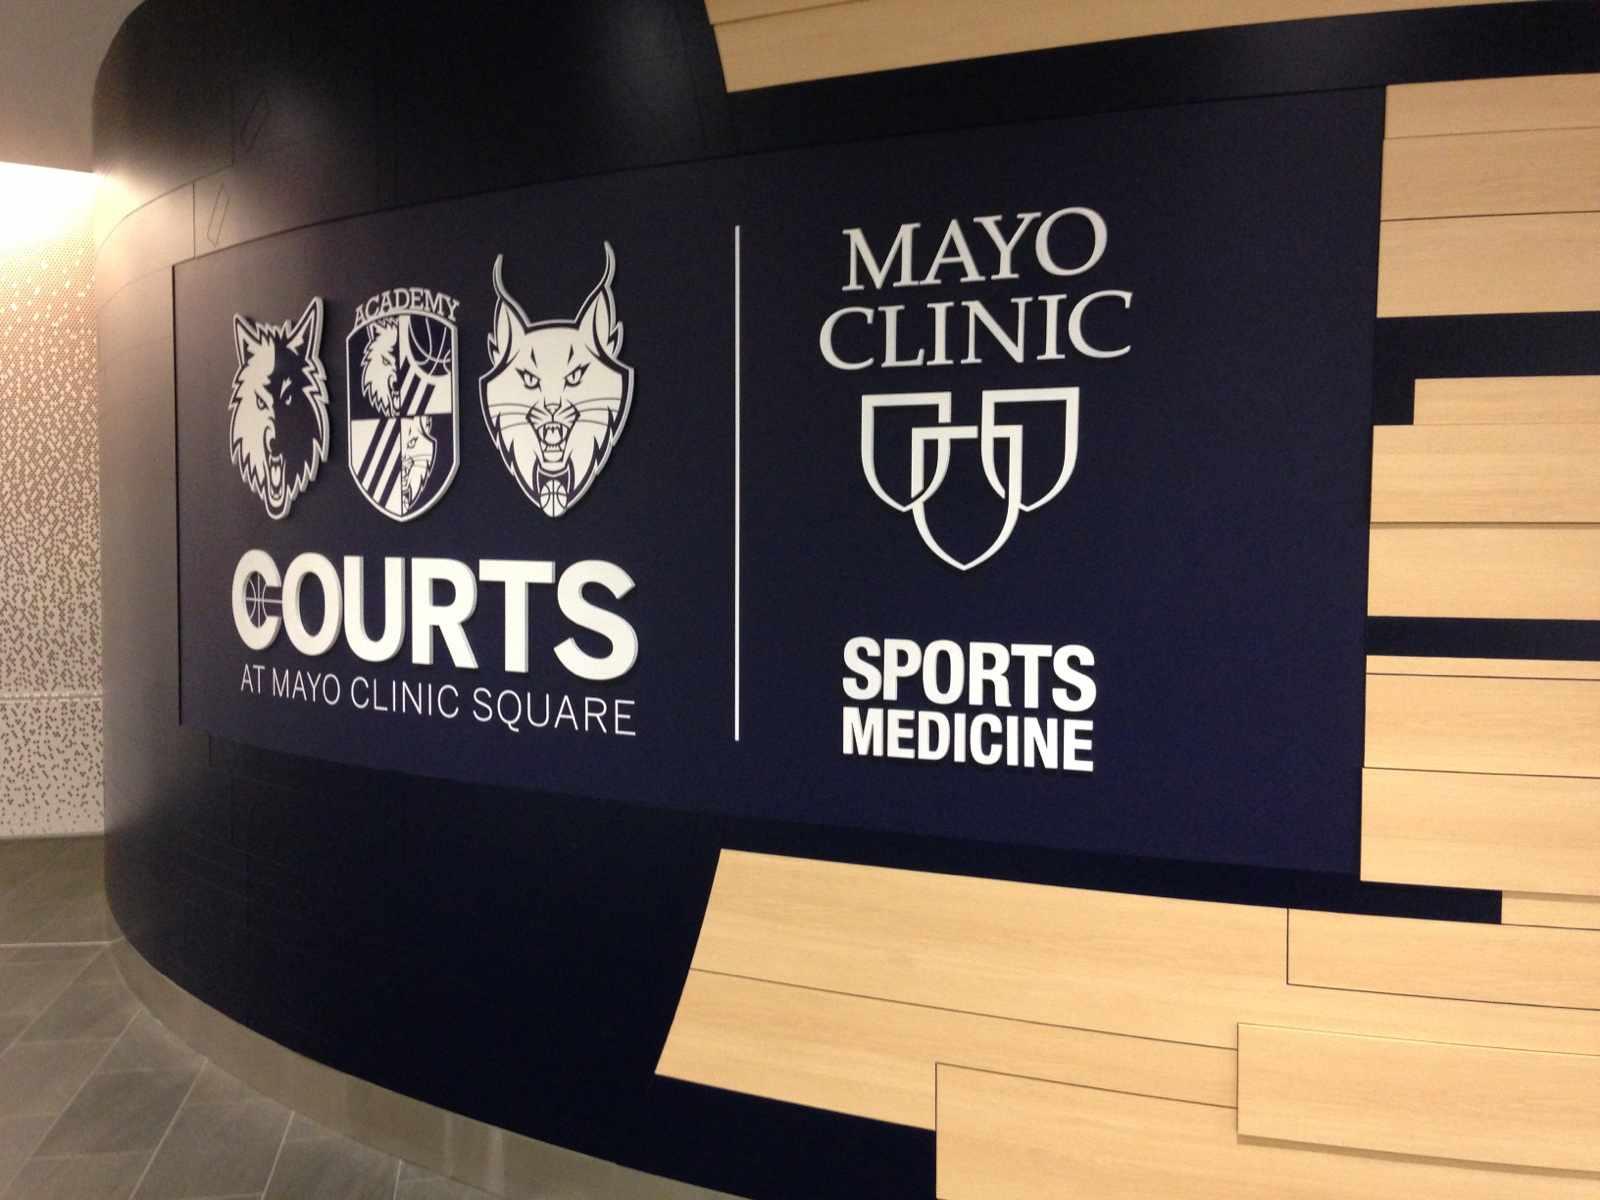 Mayo Clinic Square, Sports Medicine